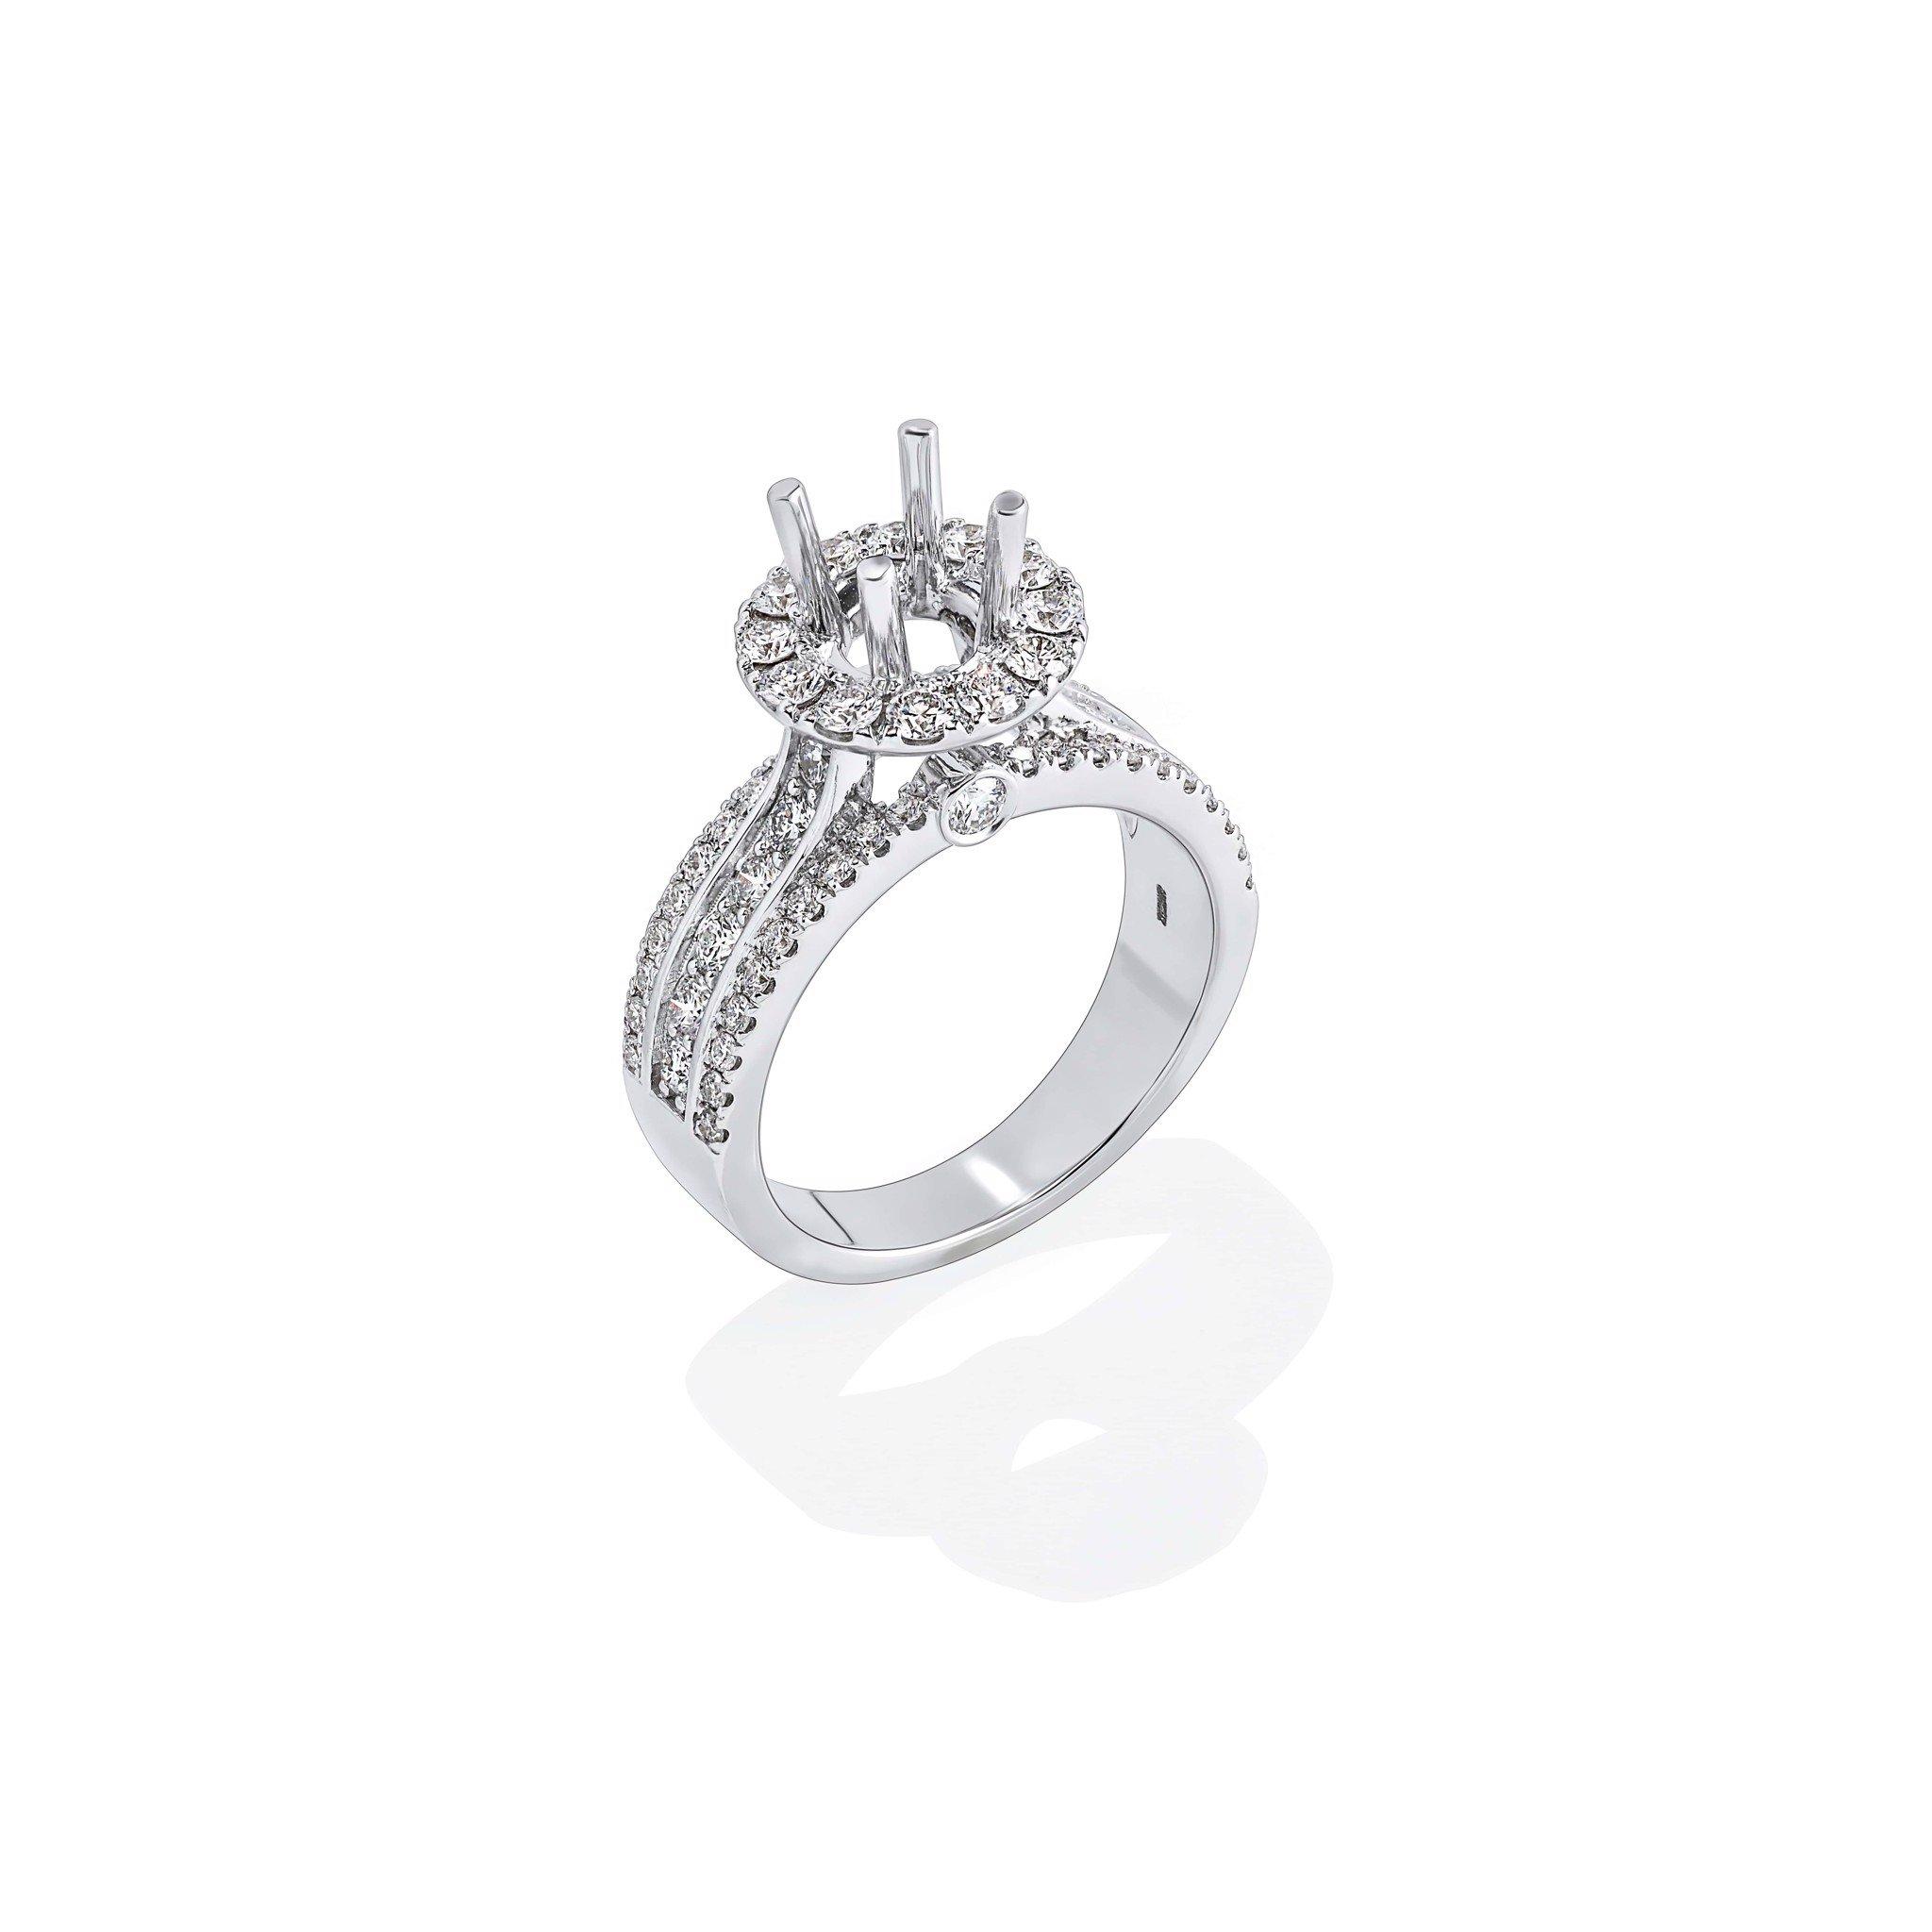 Ổ nhẫn kim cương 00539188